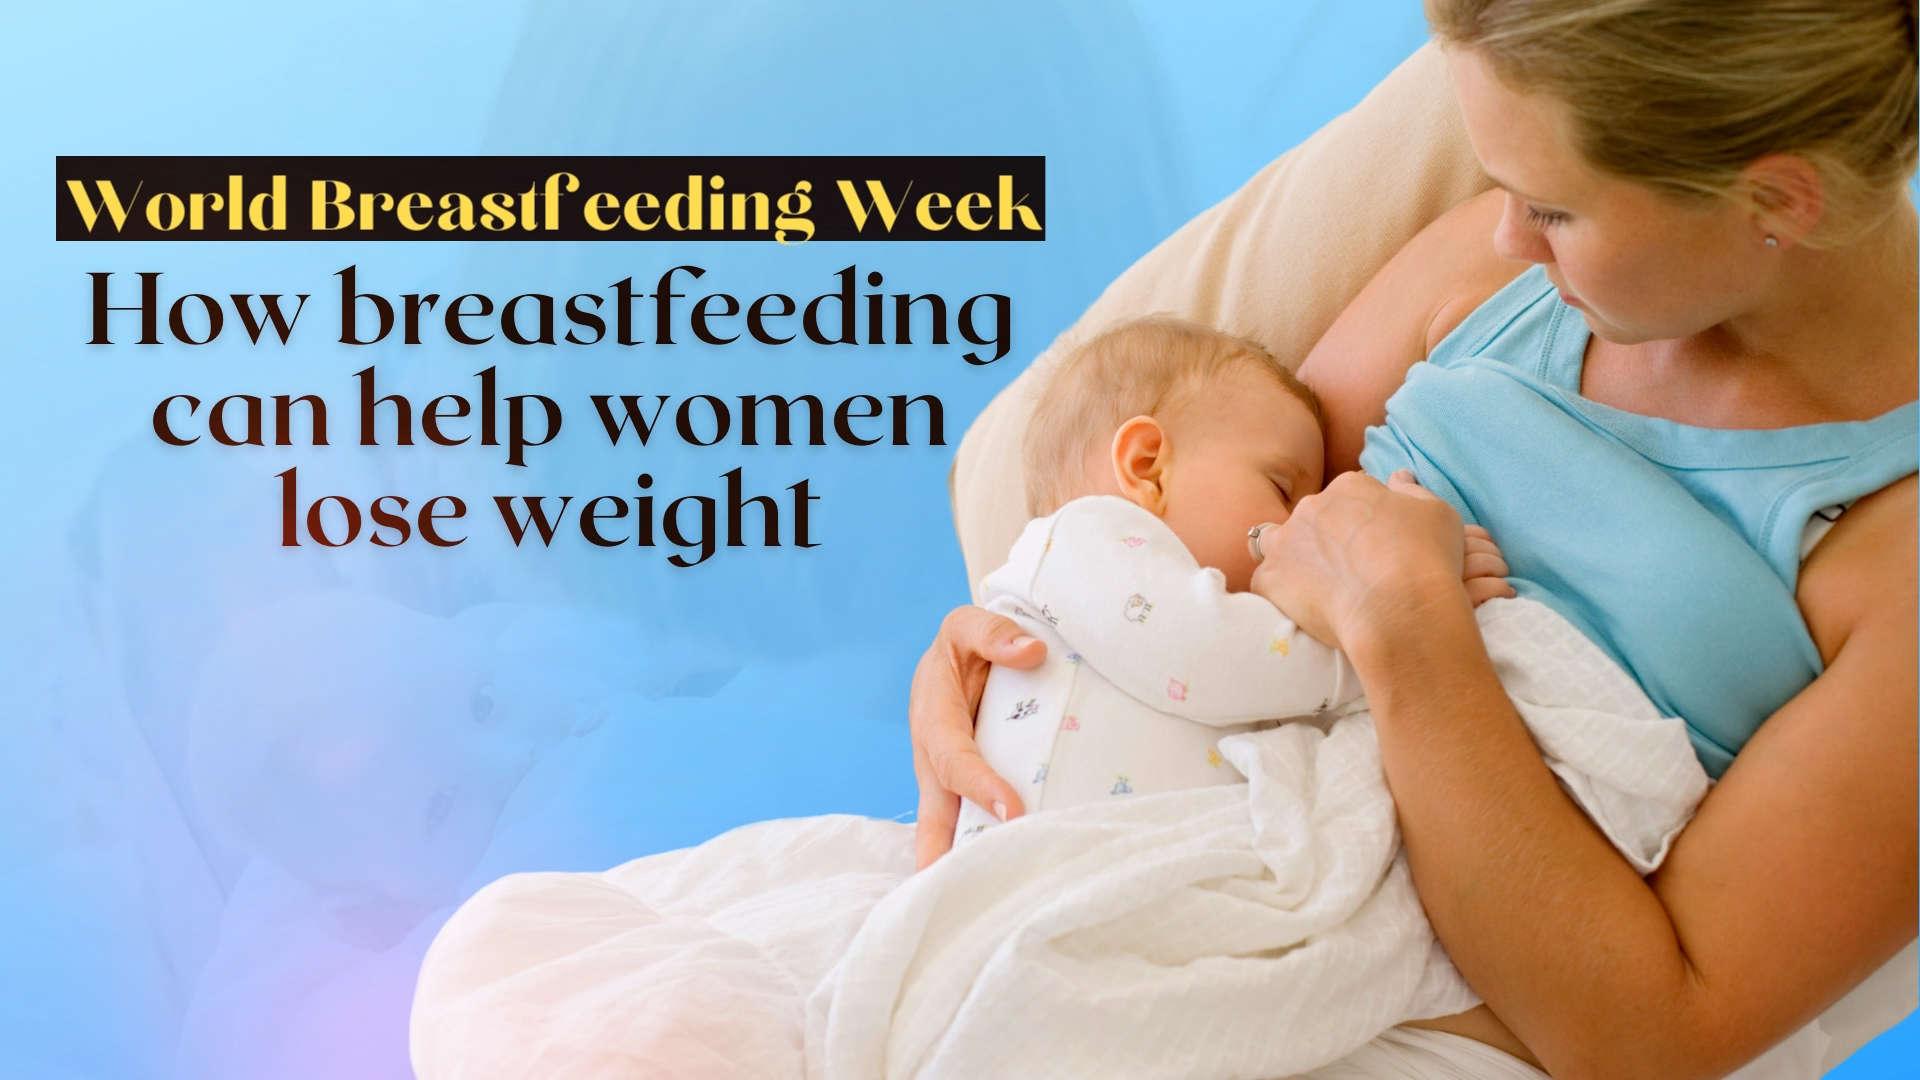 world-breastfeeding-week-how-breastfeeding-can-help-women-lose-weight